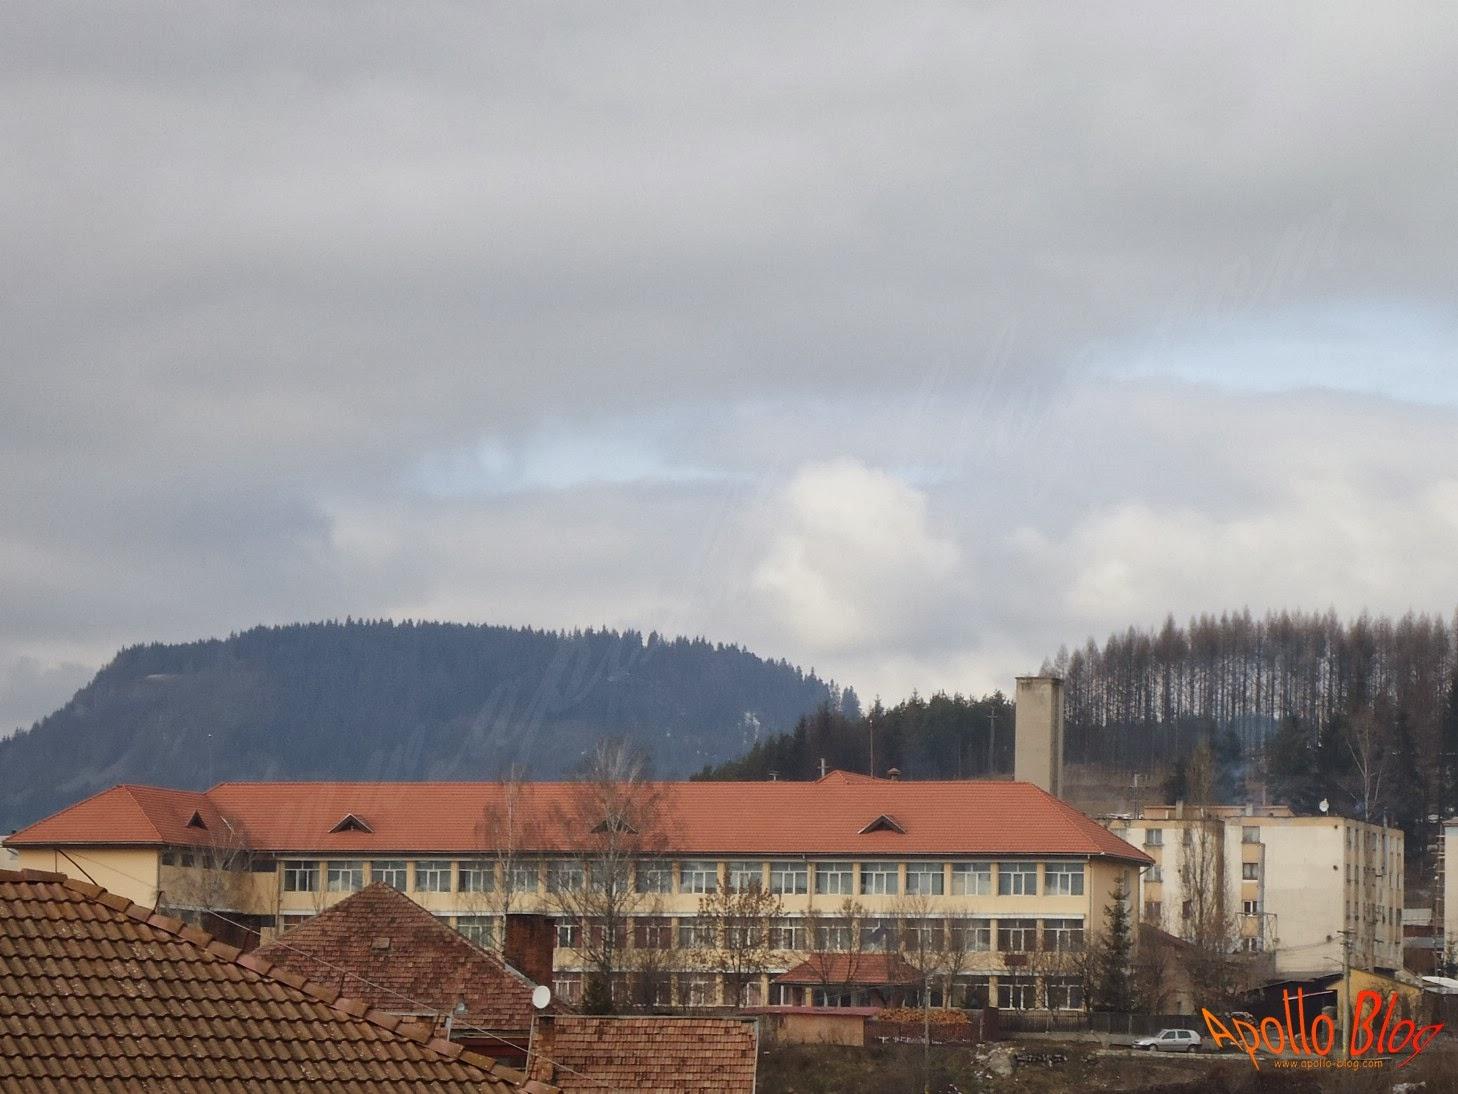 Liceul Teoretic O.C. Taslauanu Toplita